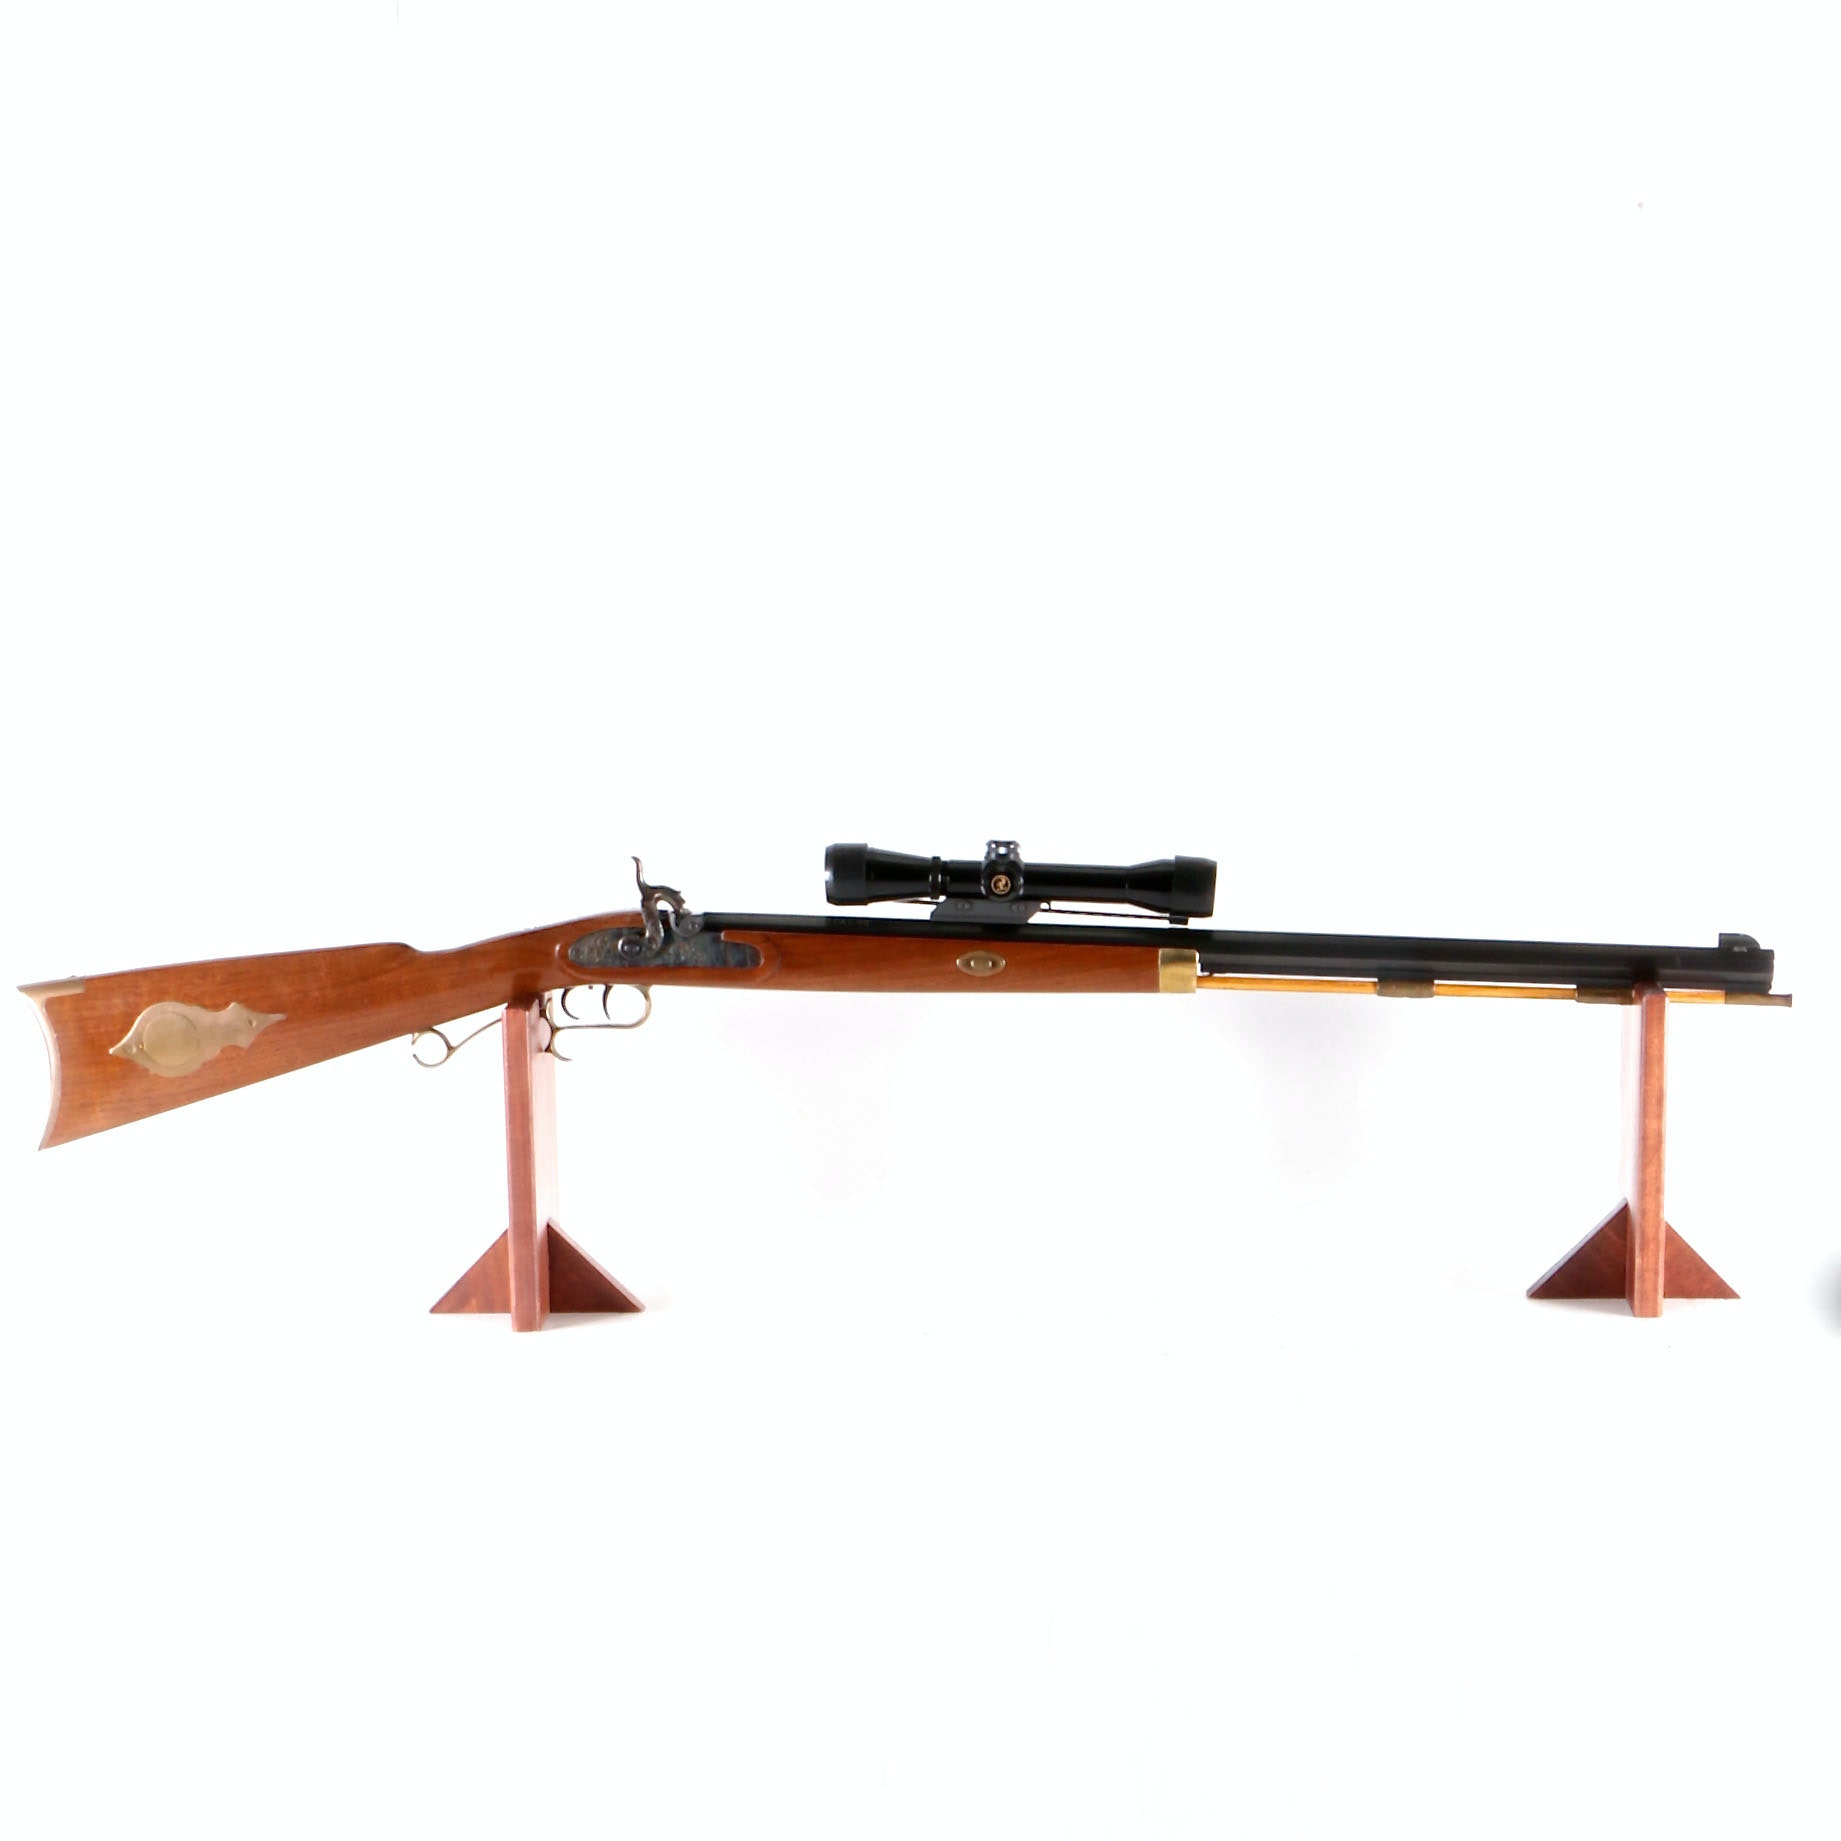 Thompson .50 Caliber Black Powder Rifle with Thompson Center Arms Rifle Scope